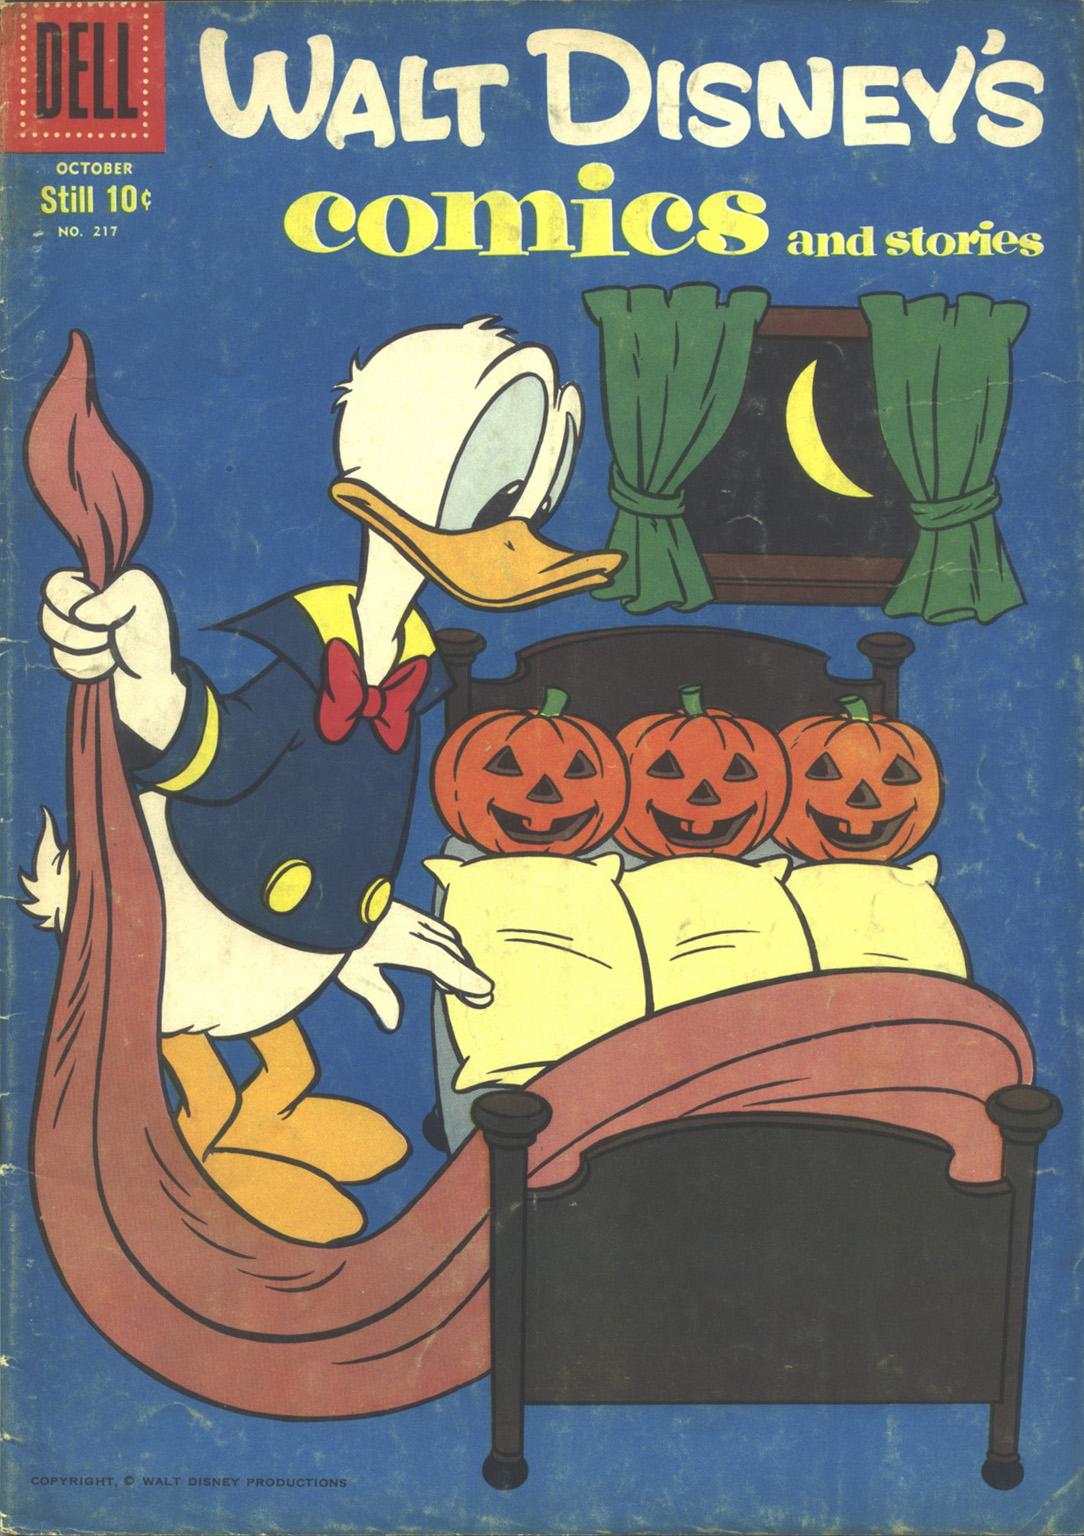 Walt Disneys Comics and Stories 217 Page 1